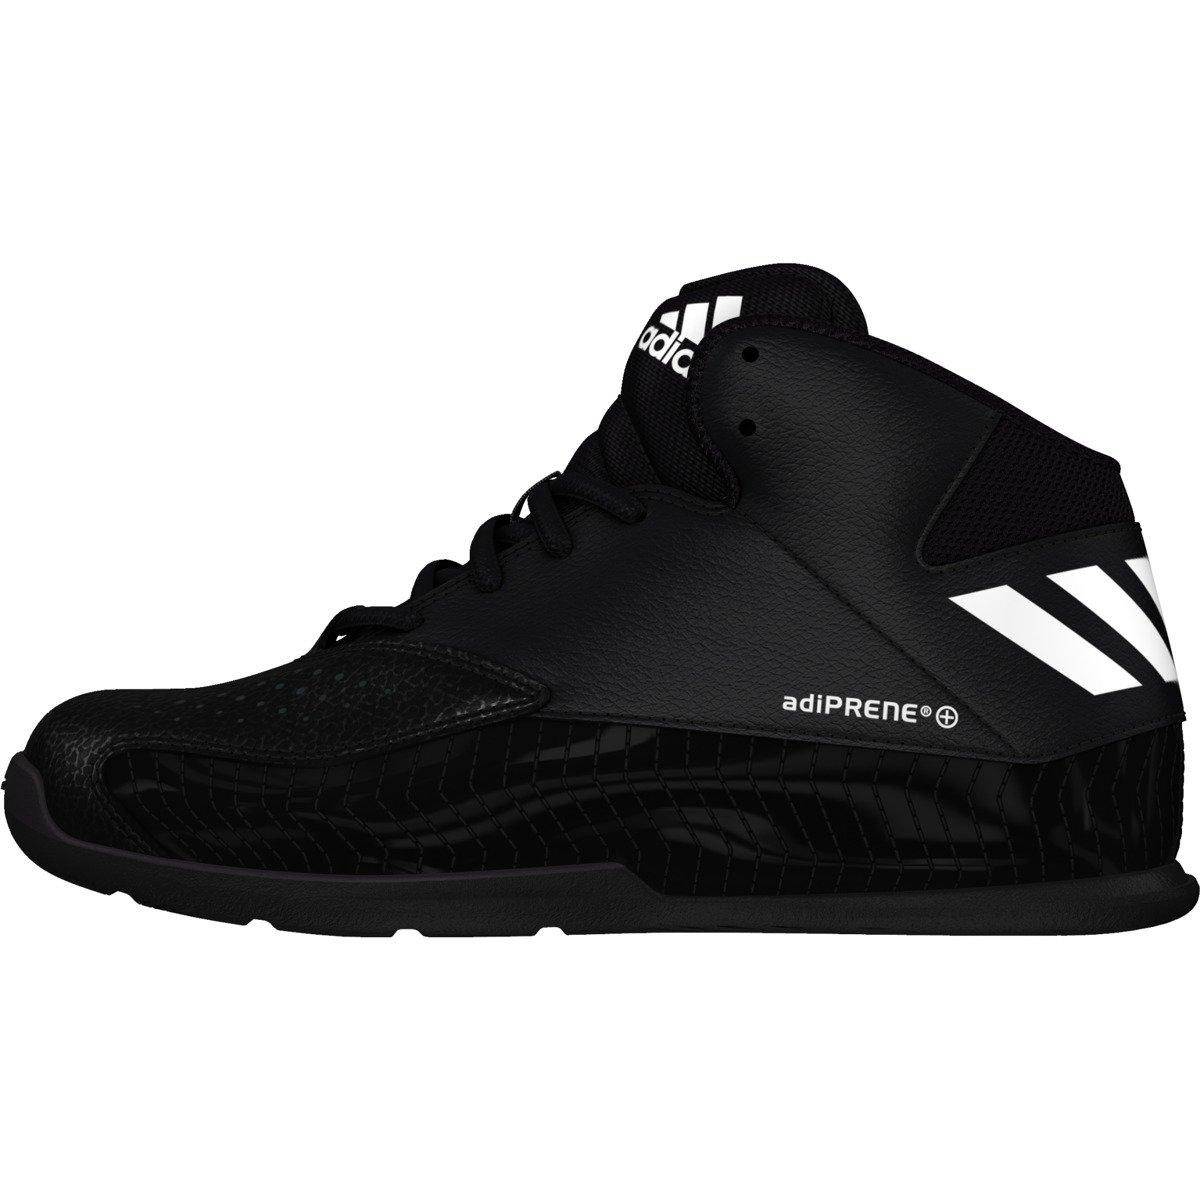 Adidas Next Level Speed 5 Shoes - BW0499 czarny  7807ae47a